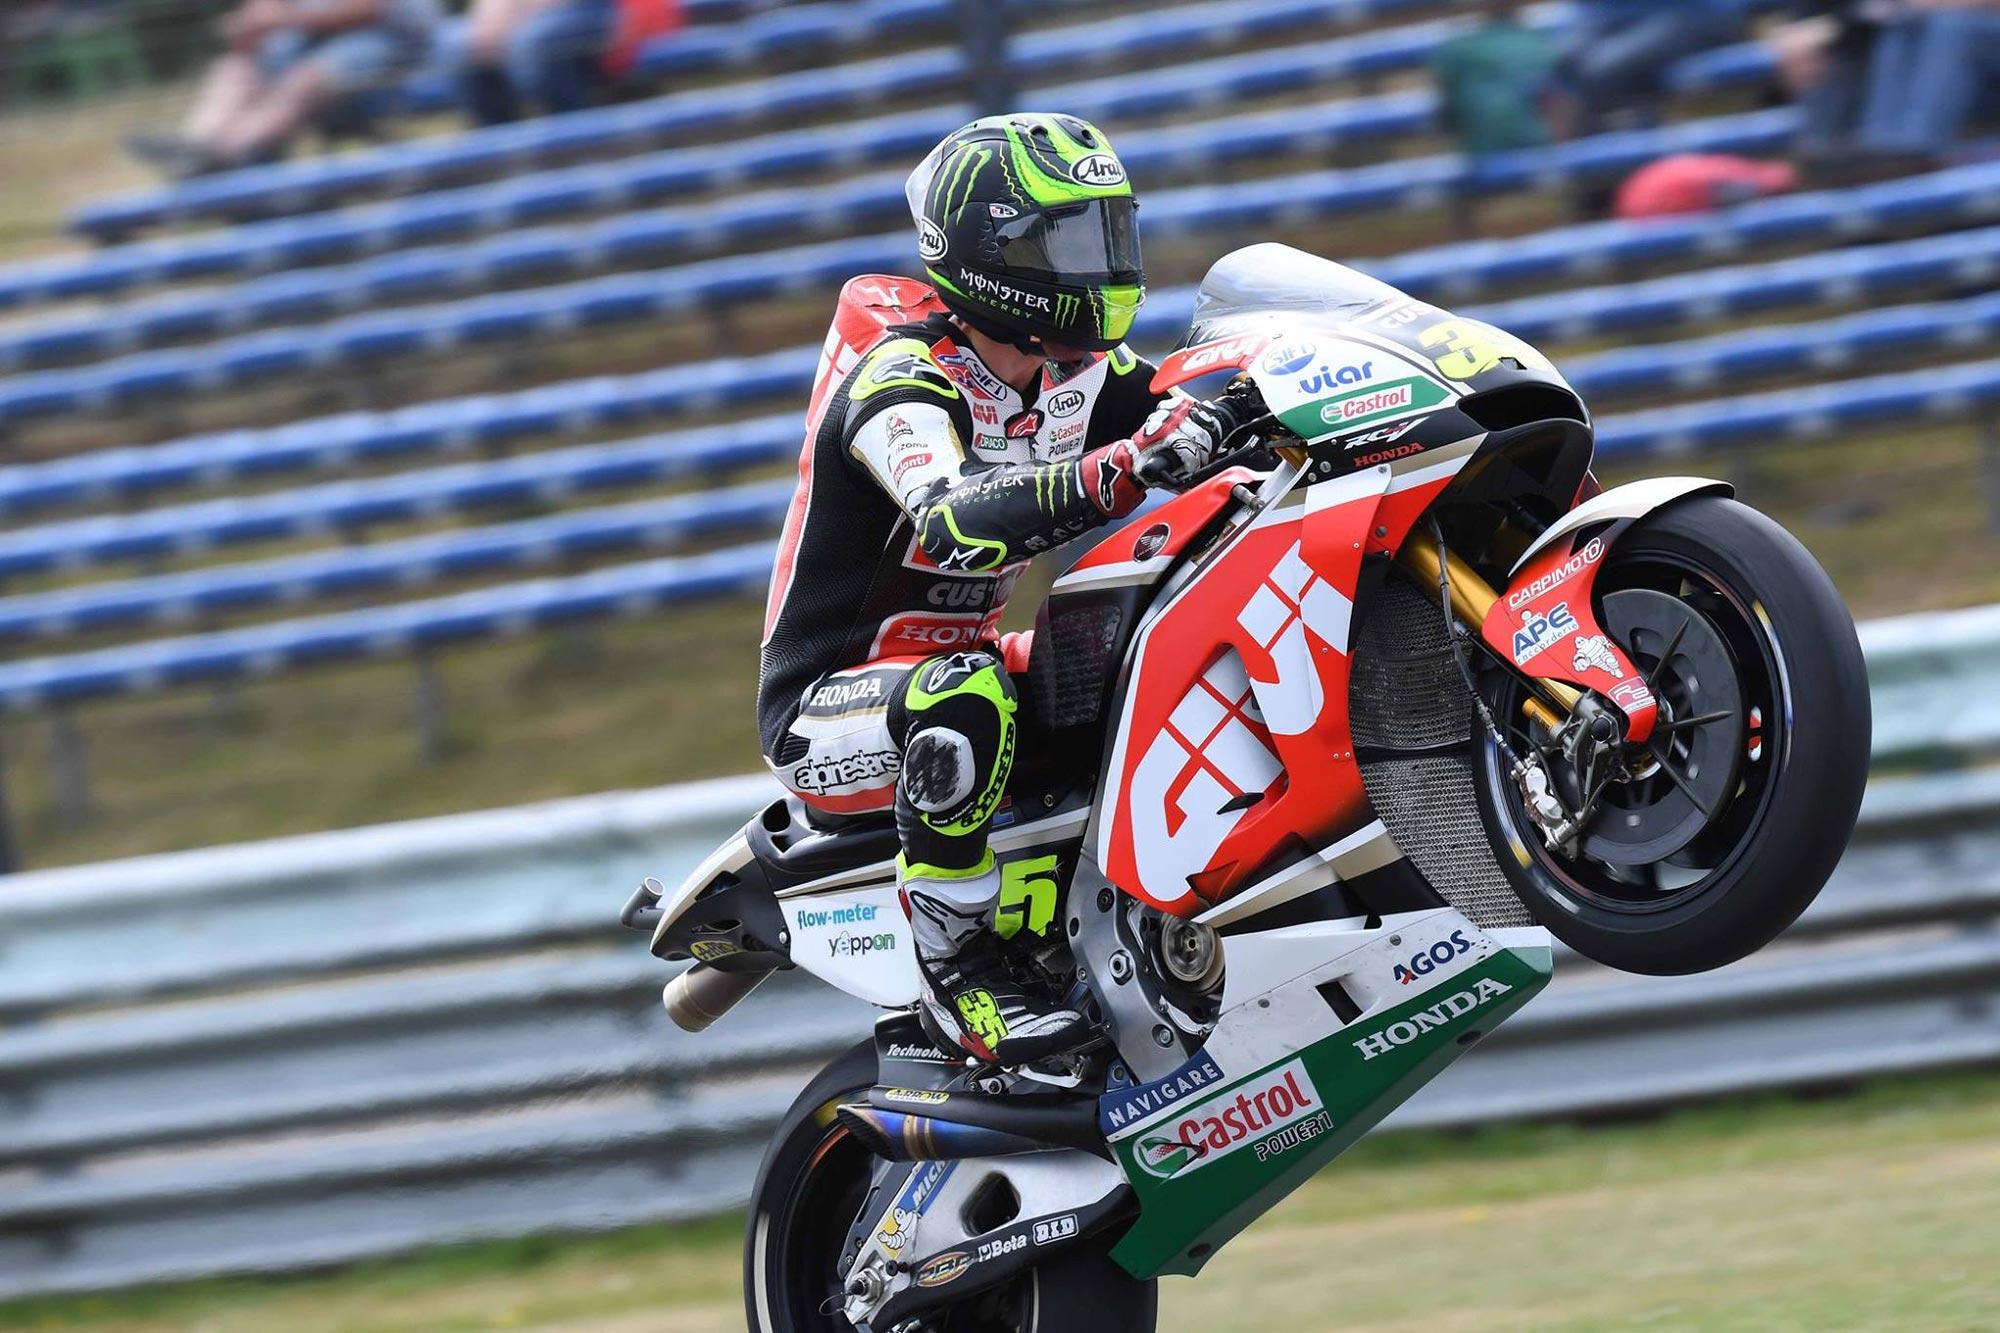 Friday MotoGP Summary at Assen: Fast Yamahas, Unstable Bikes, & Aerodynamic Loopholes - Asphalt ...